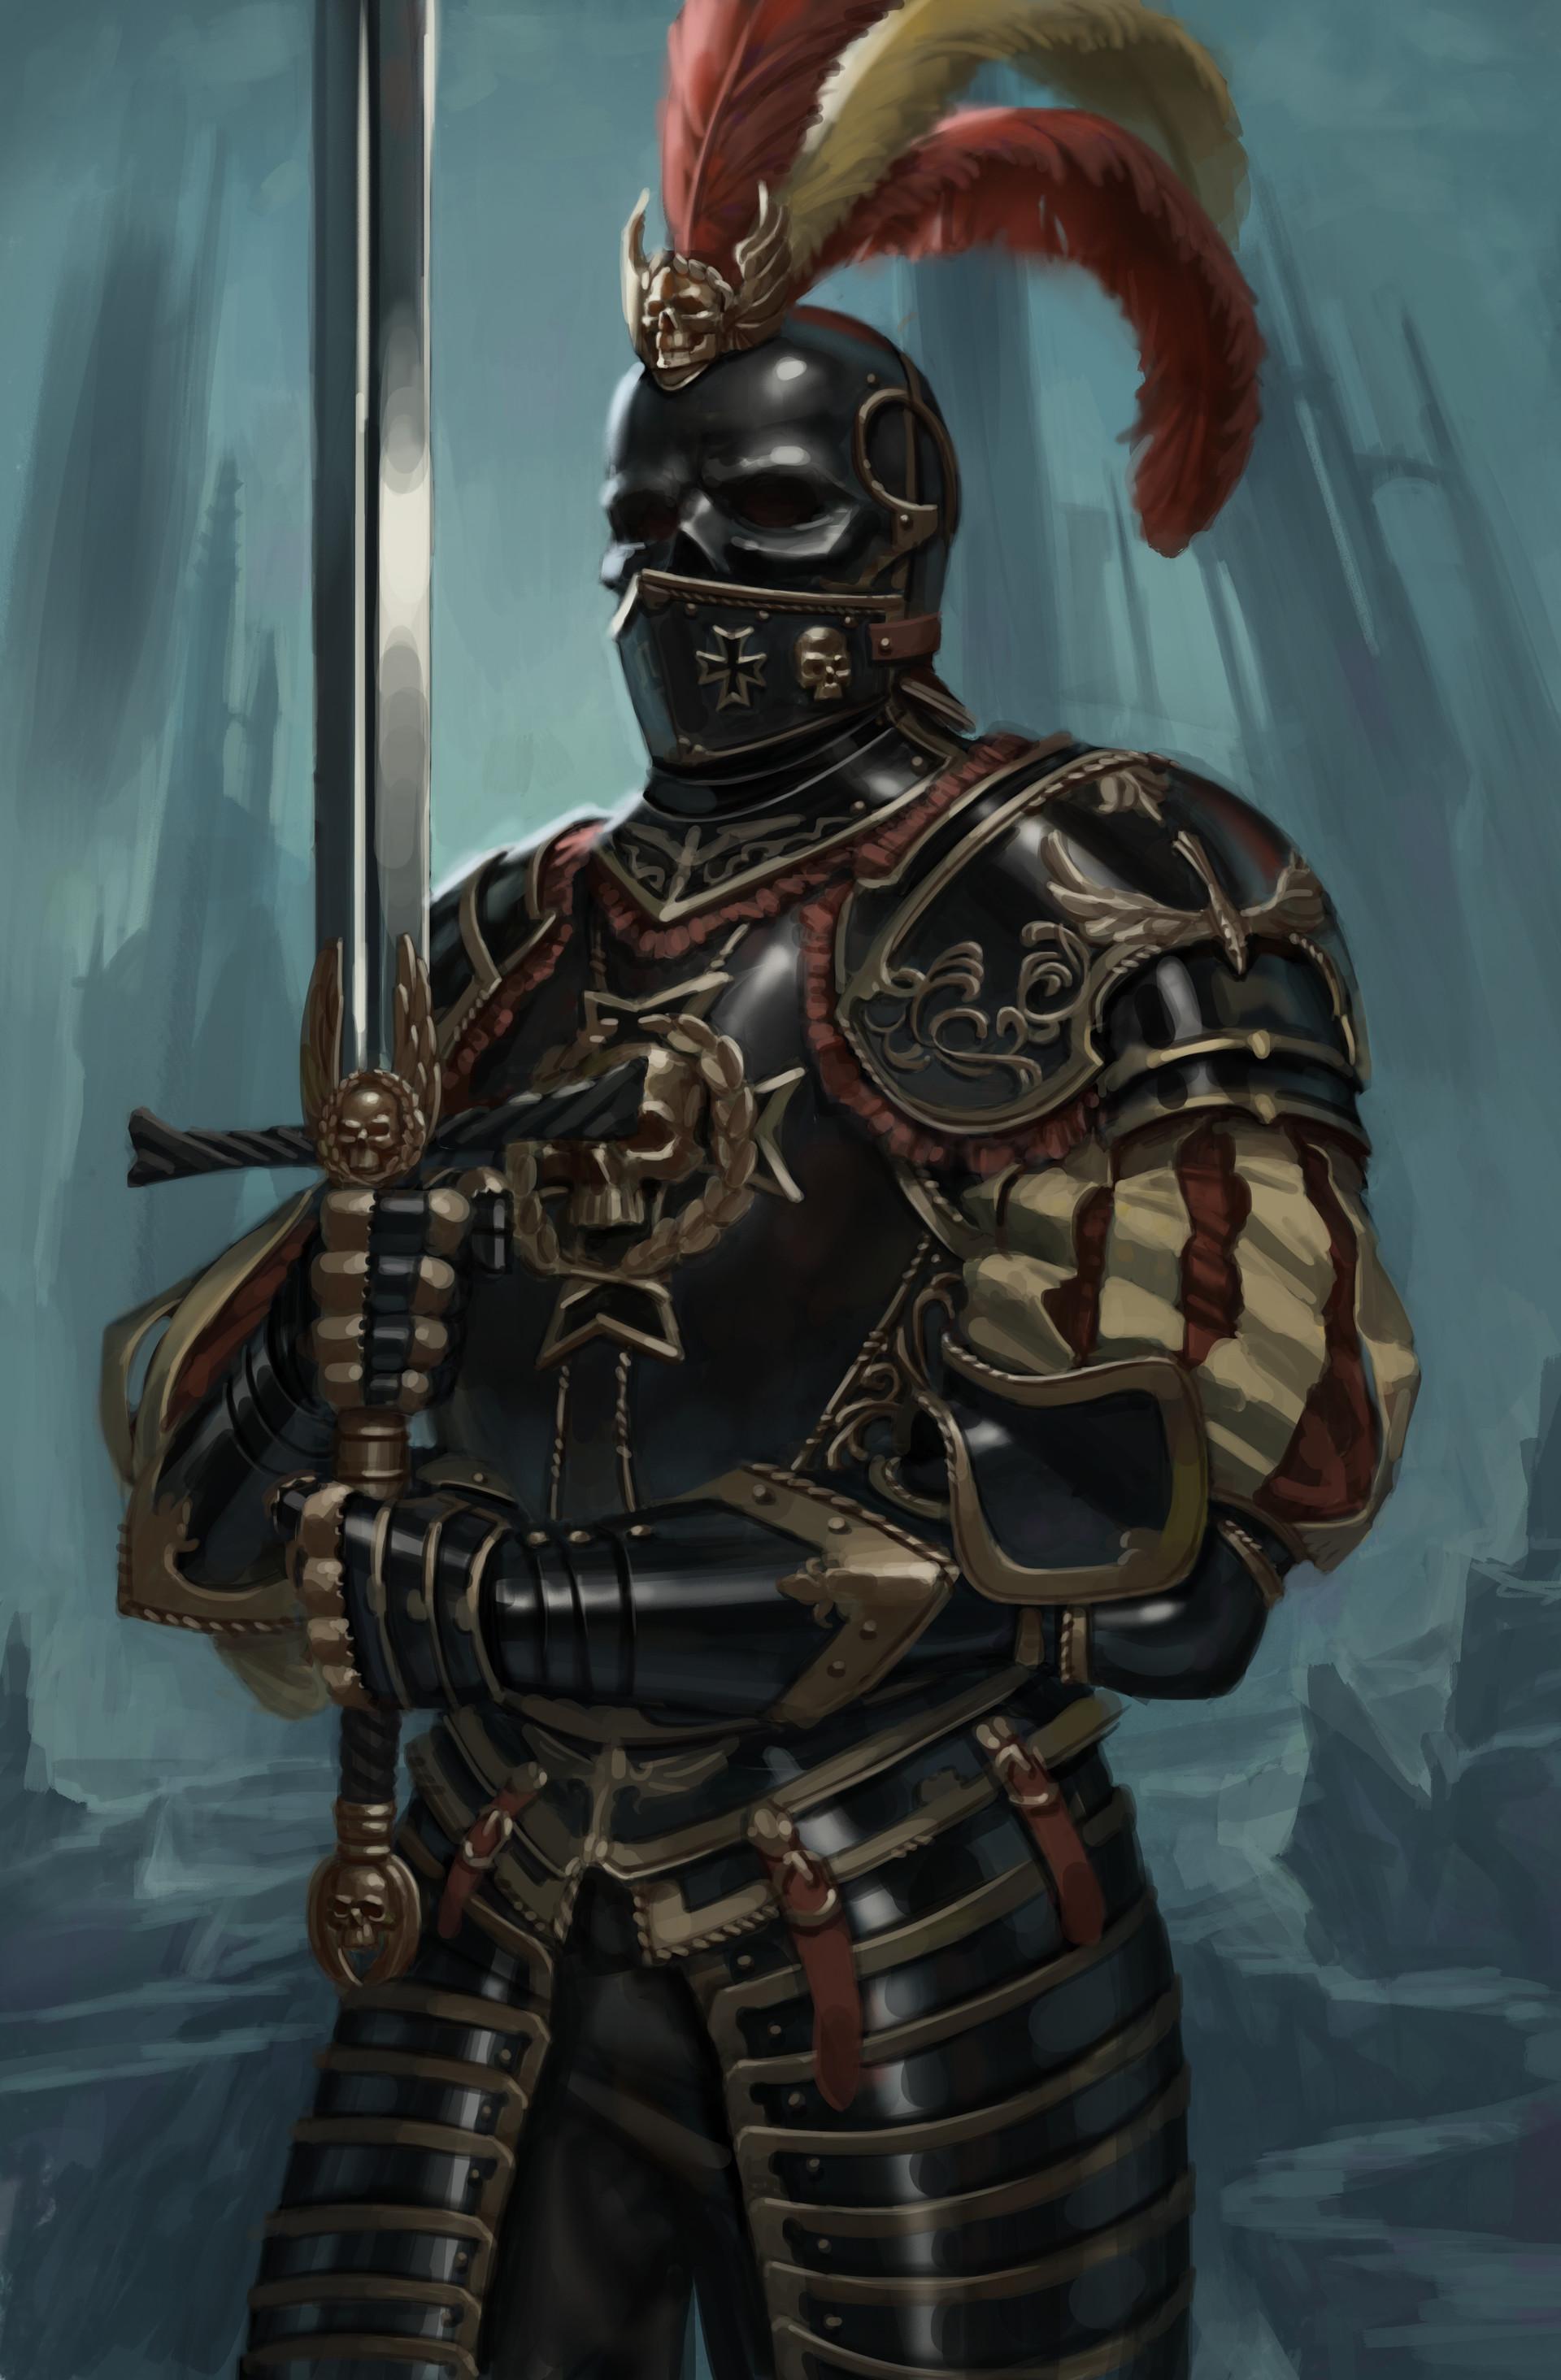 ArtStation - Black Guard of Morr, Riccardo Moscatello Medieval Knights Armor